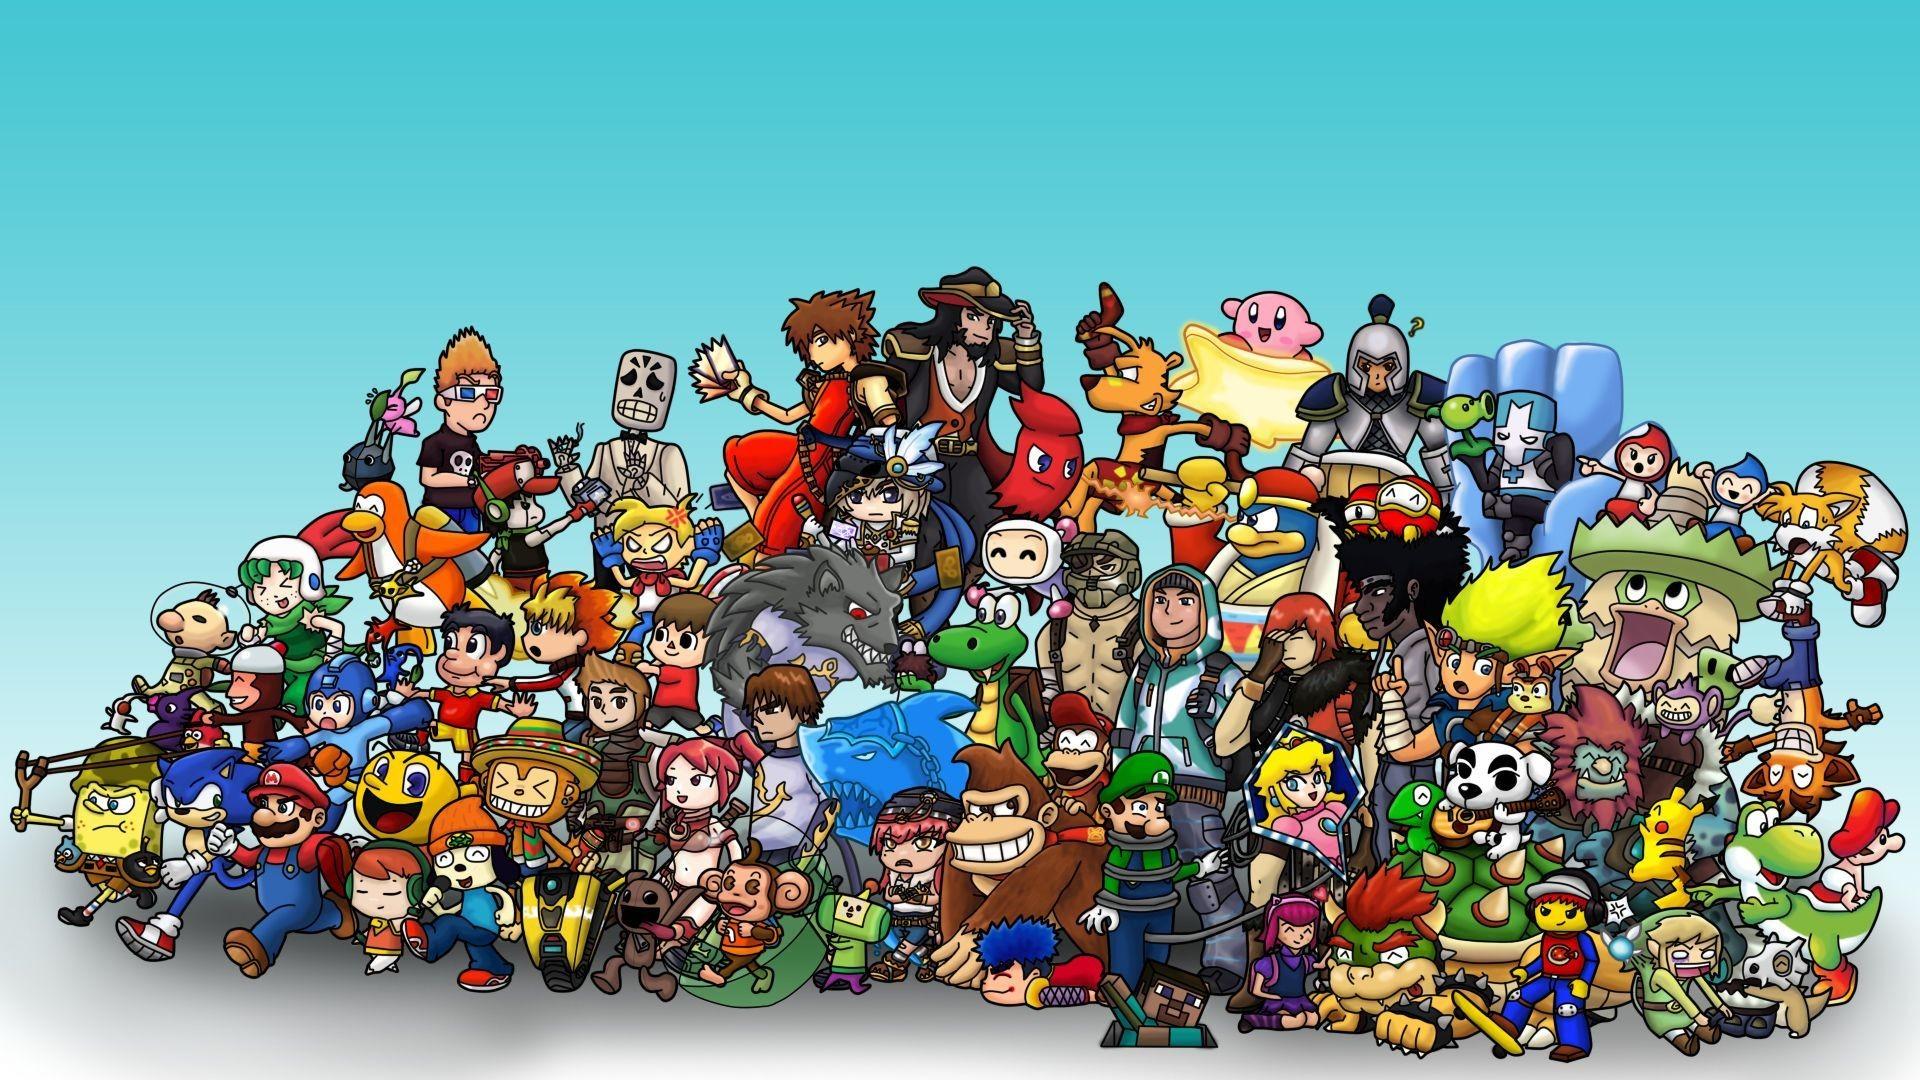 Video Game s wallpaper